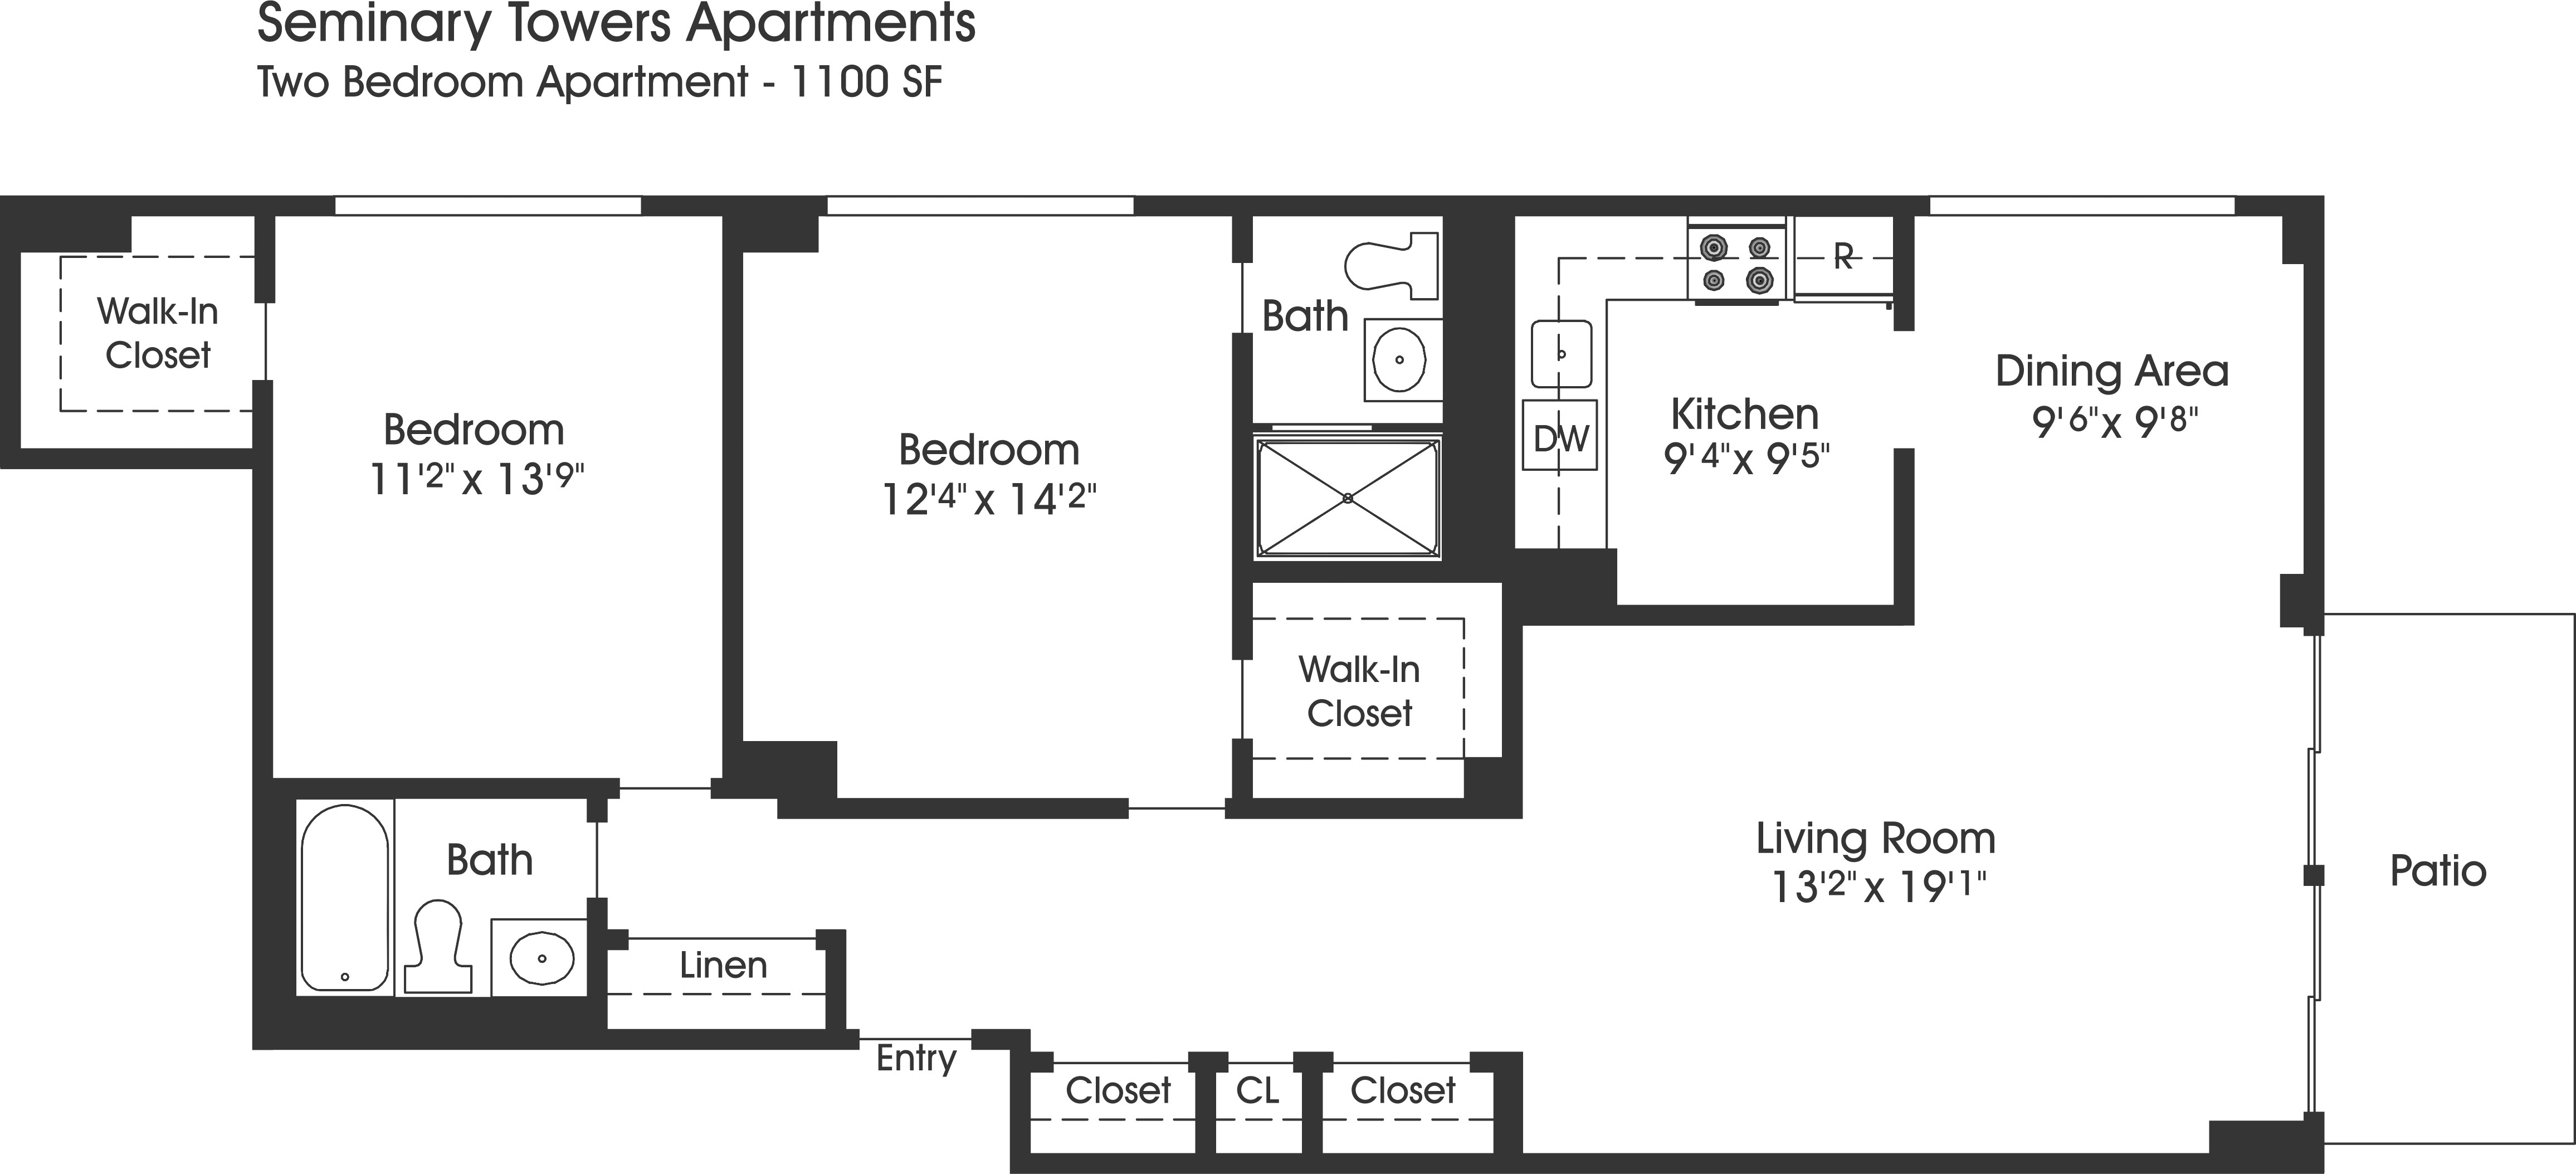 Seminary Towers Apartments